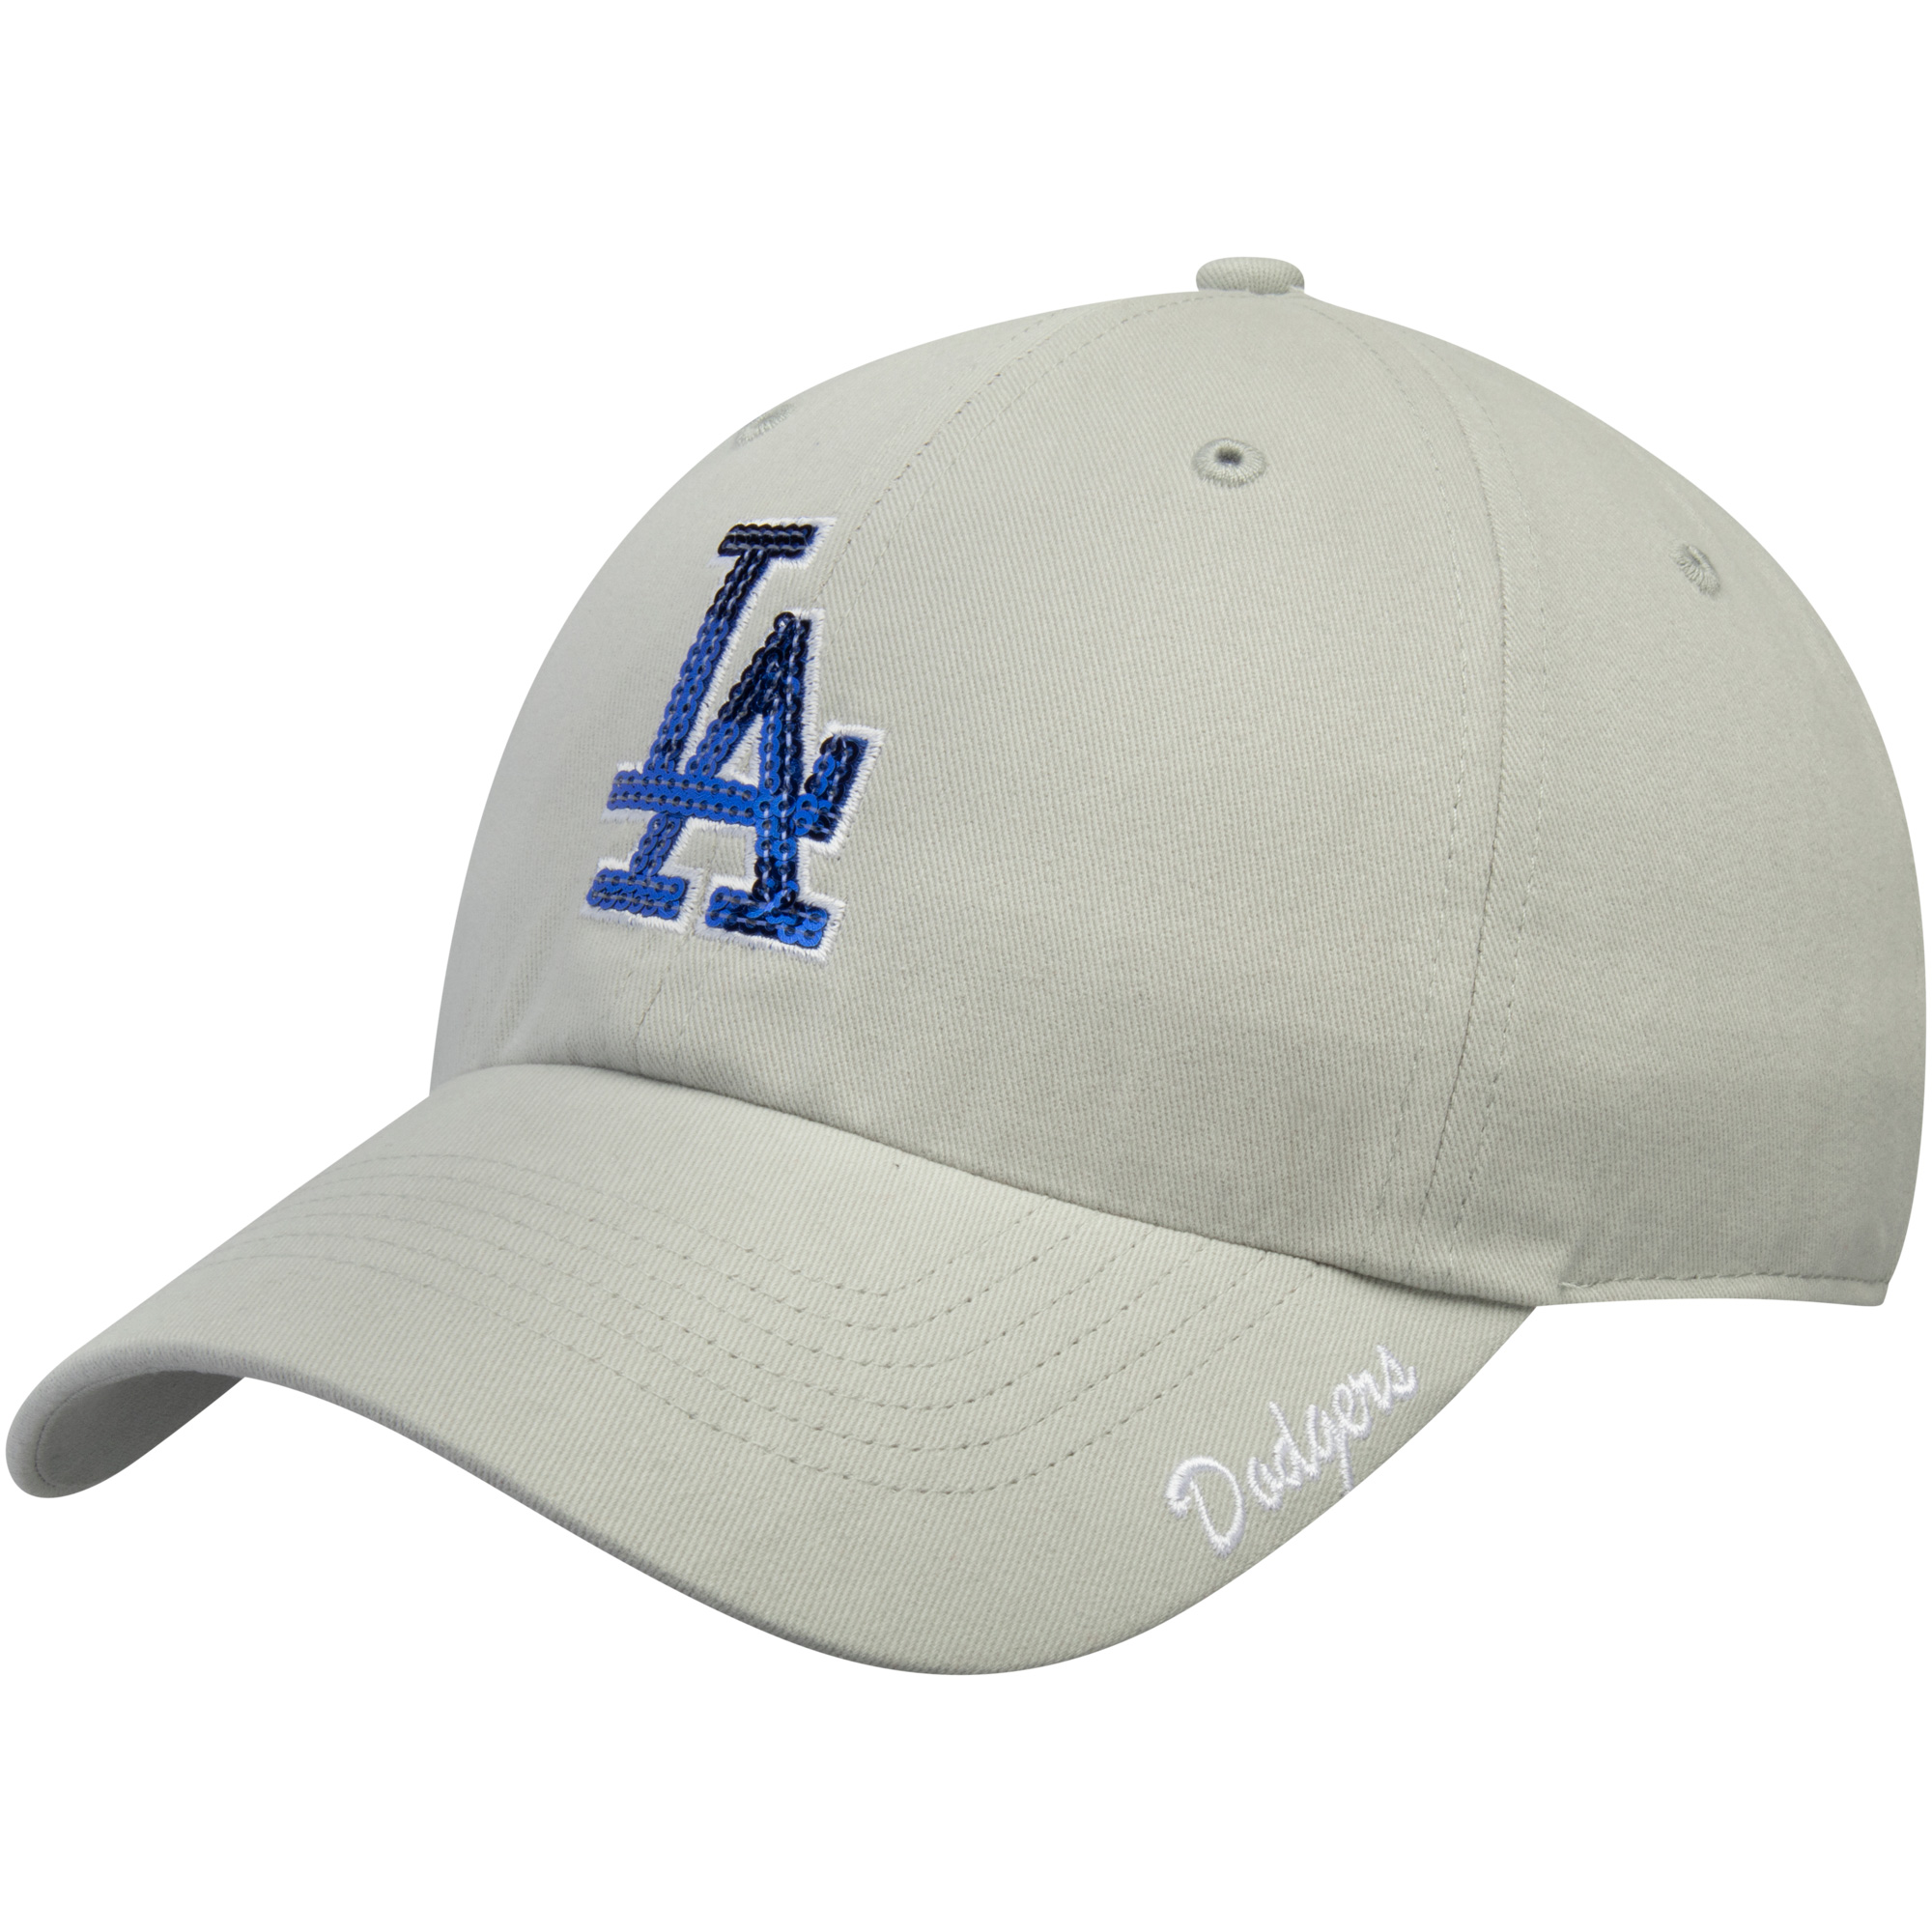 Women's '47 Gray Los Angeles Dodgers Sparkle Adjustable Hat OSFA by TWINS ENTERPRISE INC/47 BRAND